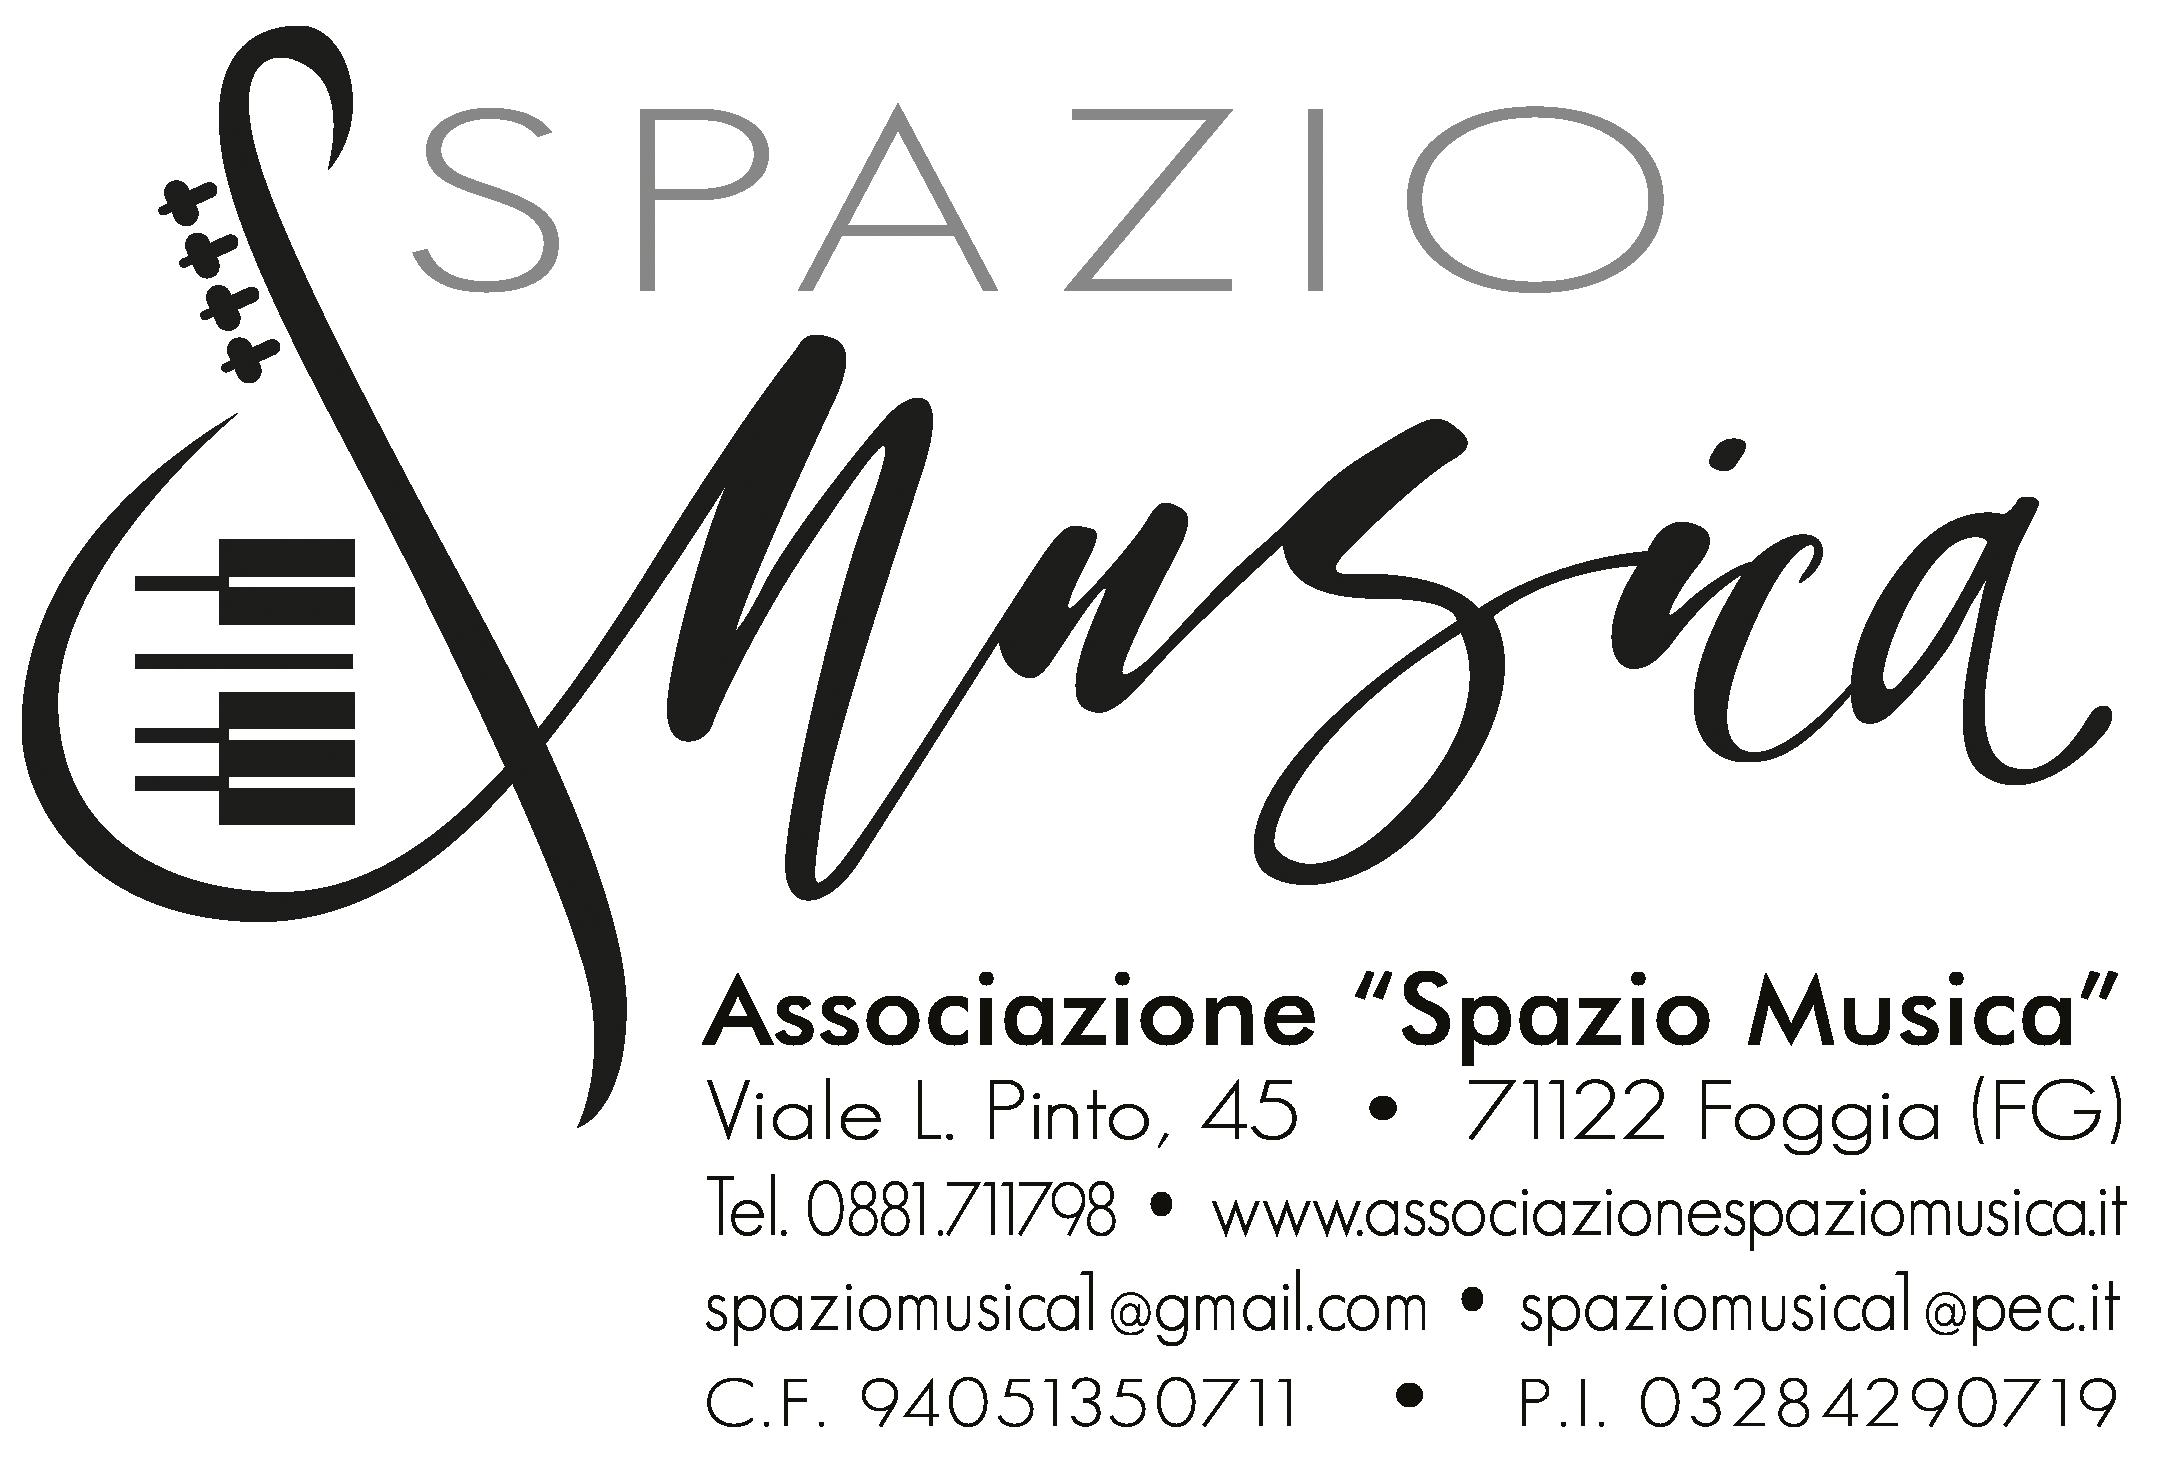 Associazione Spazio Musica